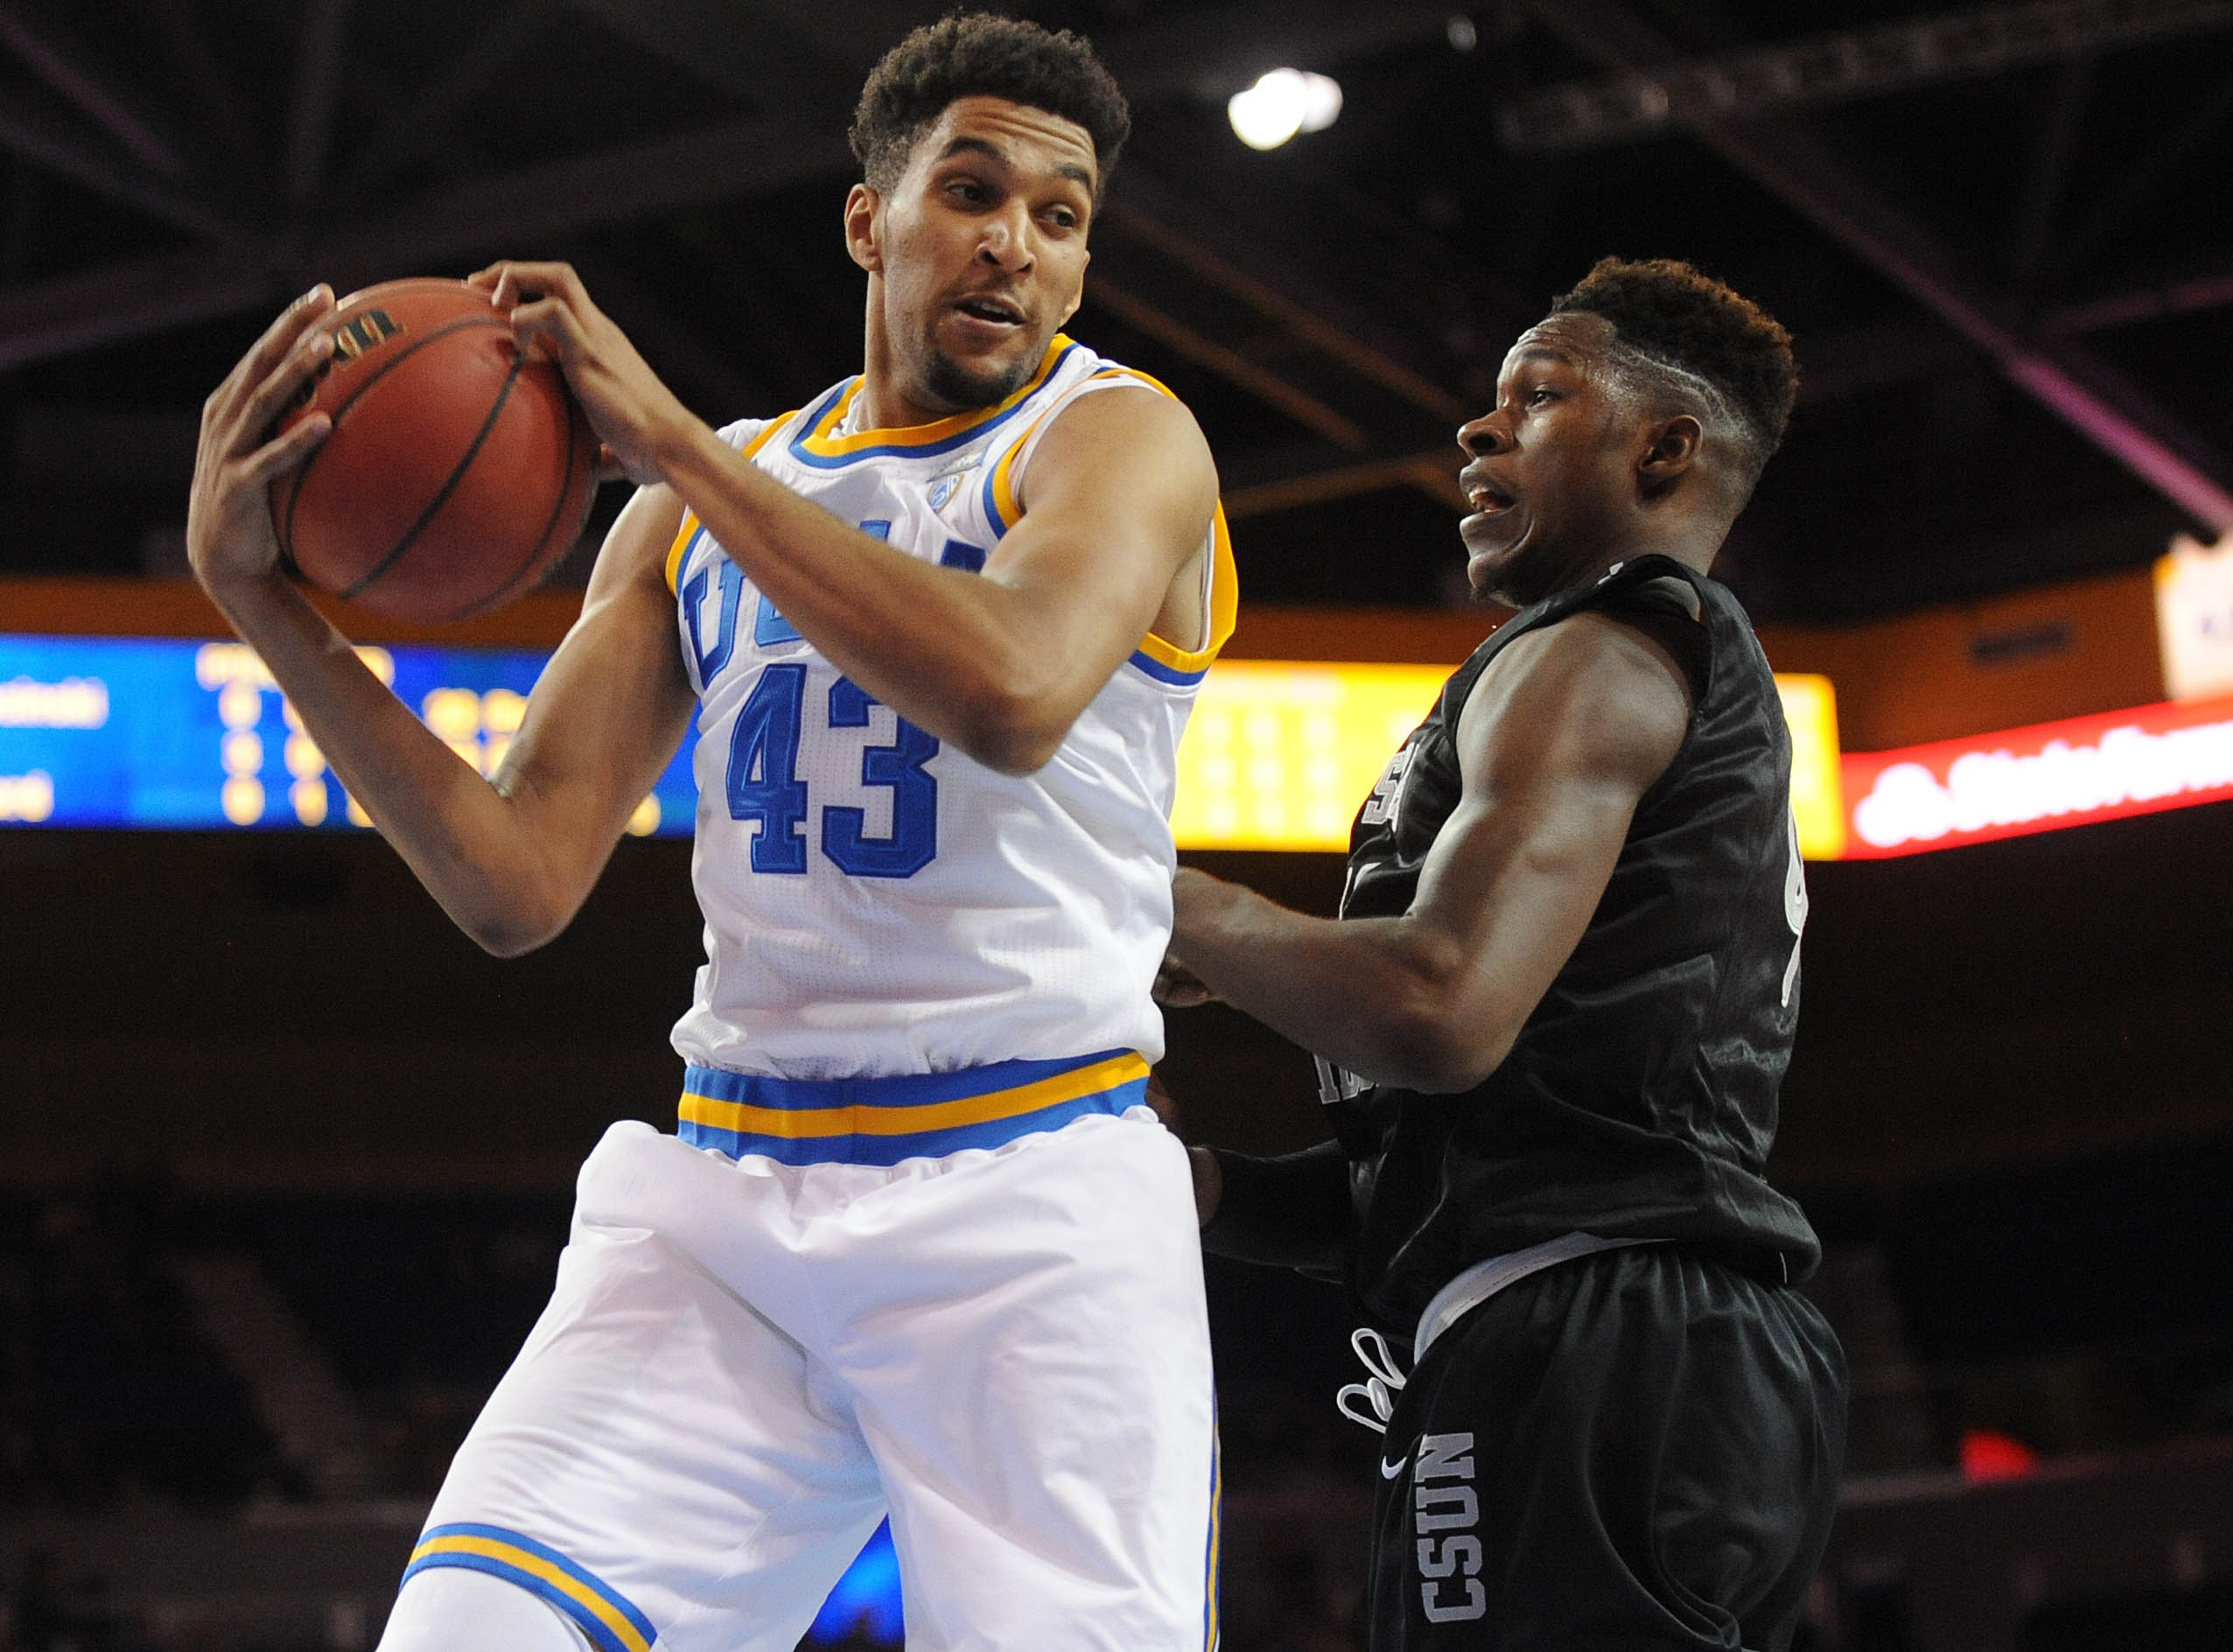 November 29 2015 Los Angeles CA USA UCLA Bruins Guard Jonah Bolden 43 Grabs A Rebound Against CSU Northridge Matadors During The First Half At Pauley